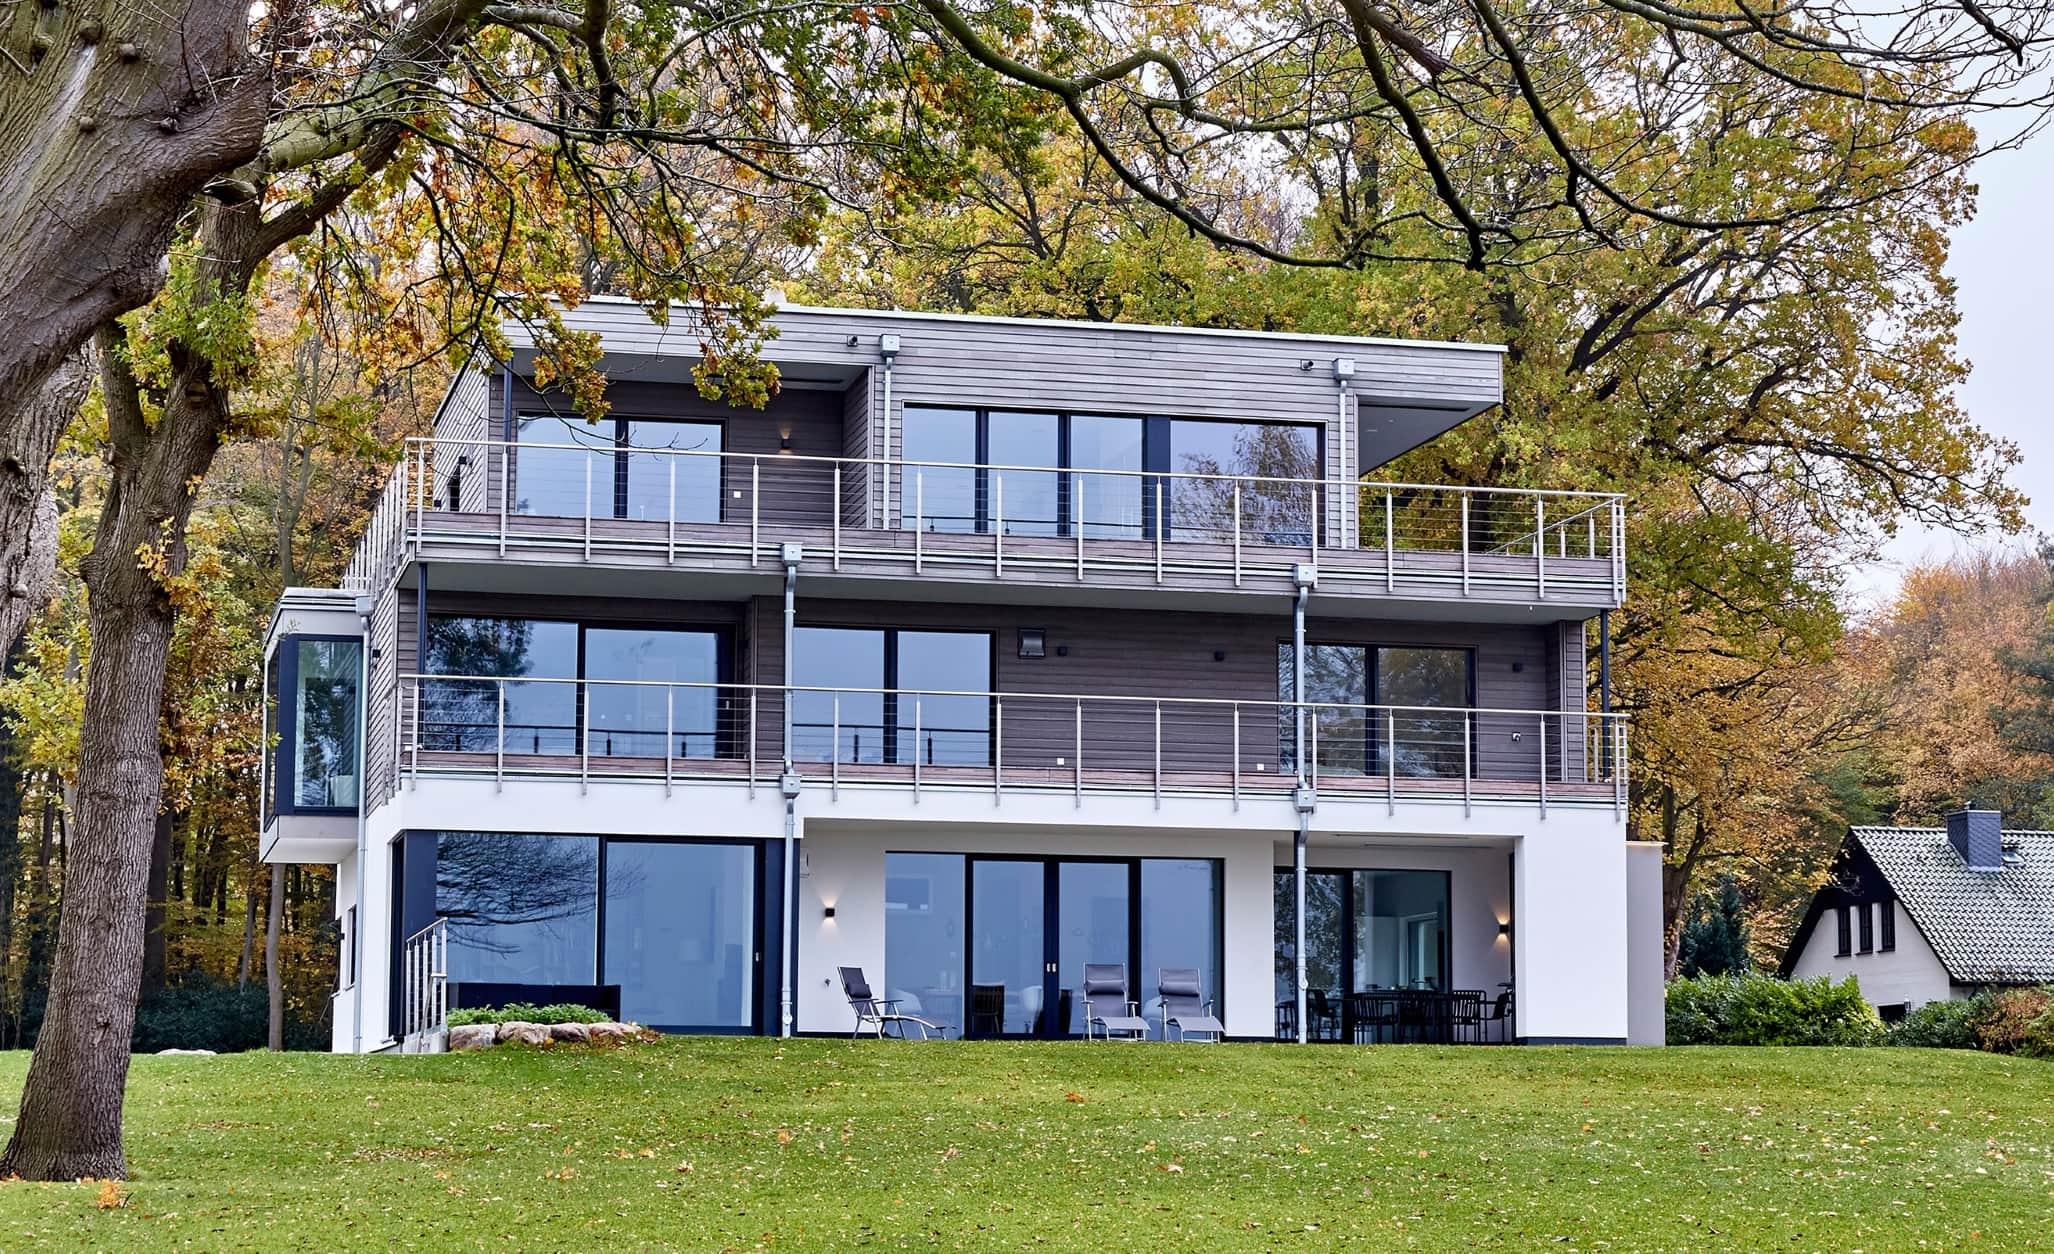 Bauhaus Stadtvilla Neubau modern mit Flachdach & Holz Putz Fassade - Haus bauen Ideen BAUFRITZ Architektenhaus MEHRBLICK - HausbauDirekt.de